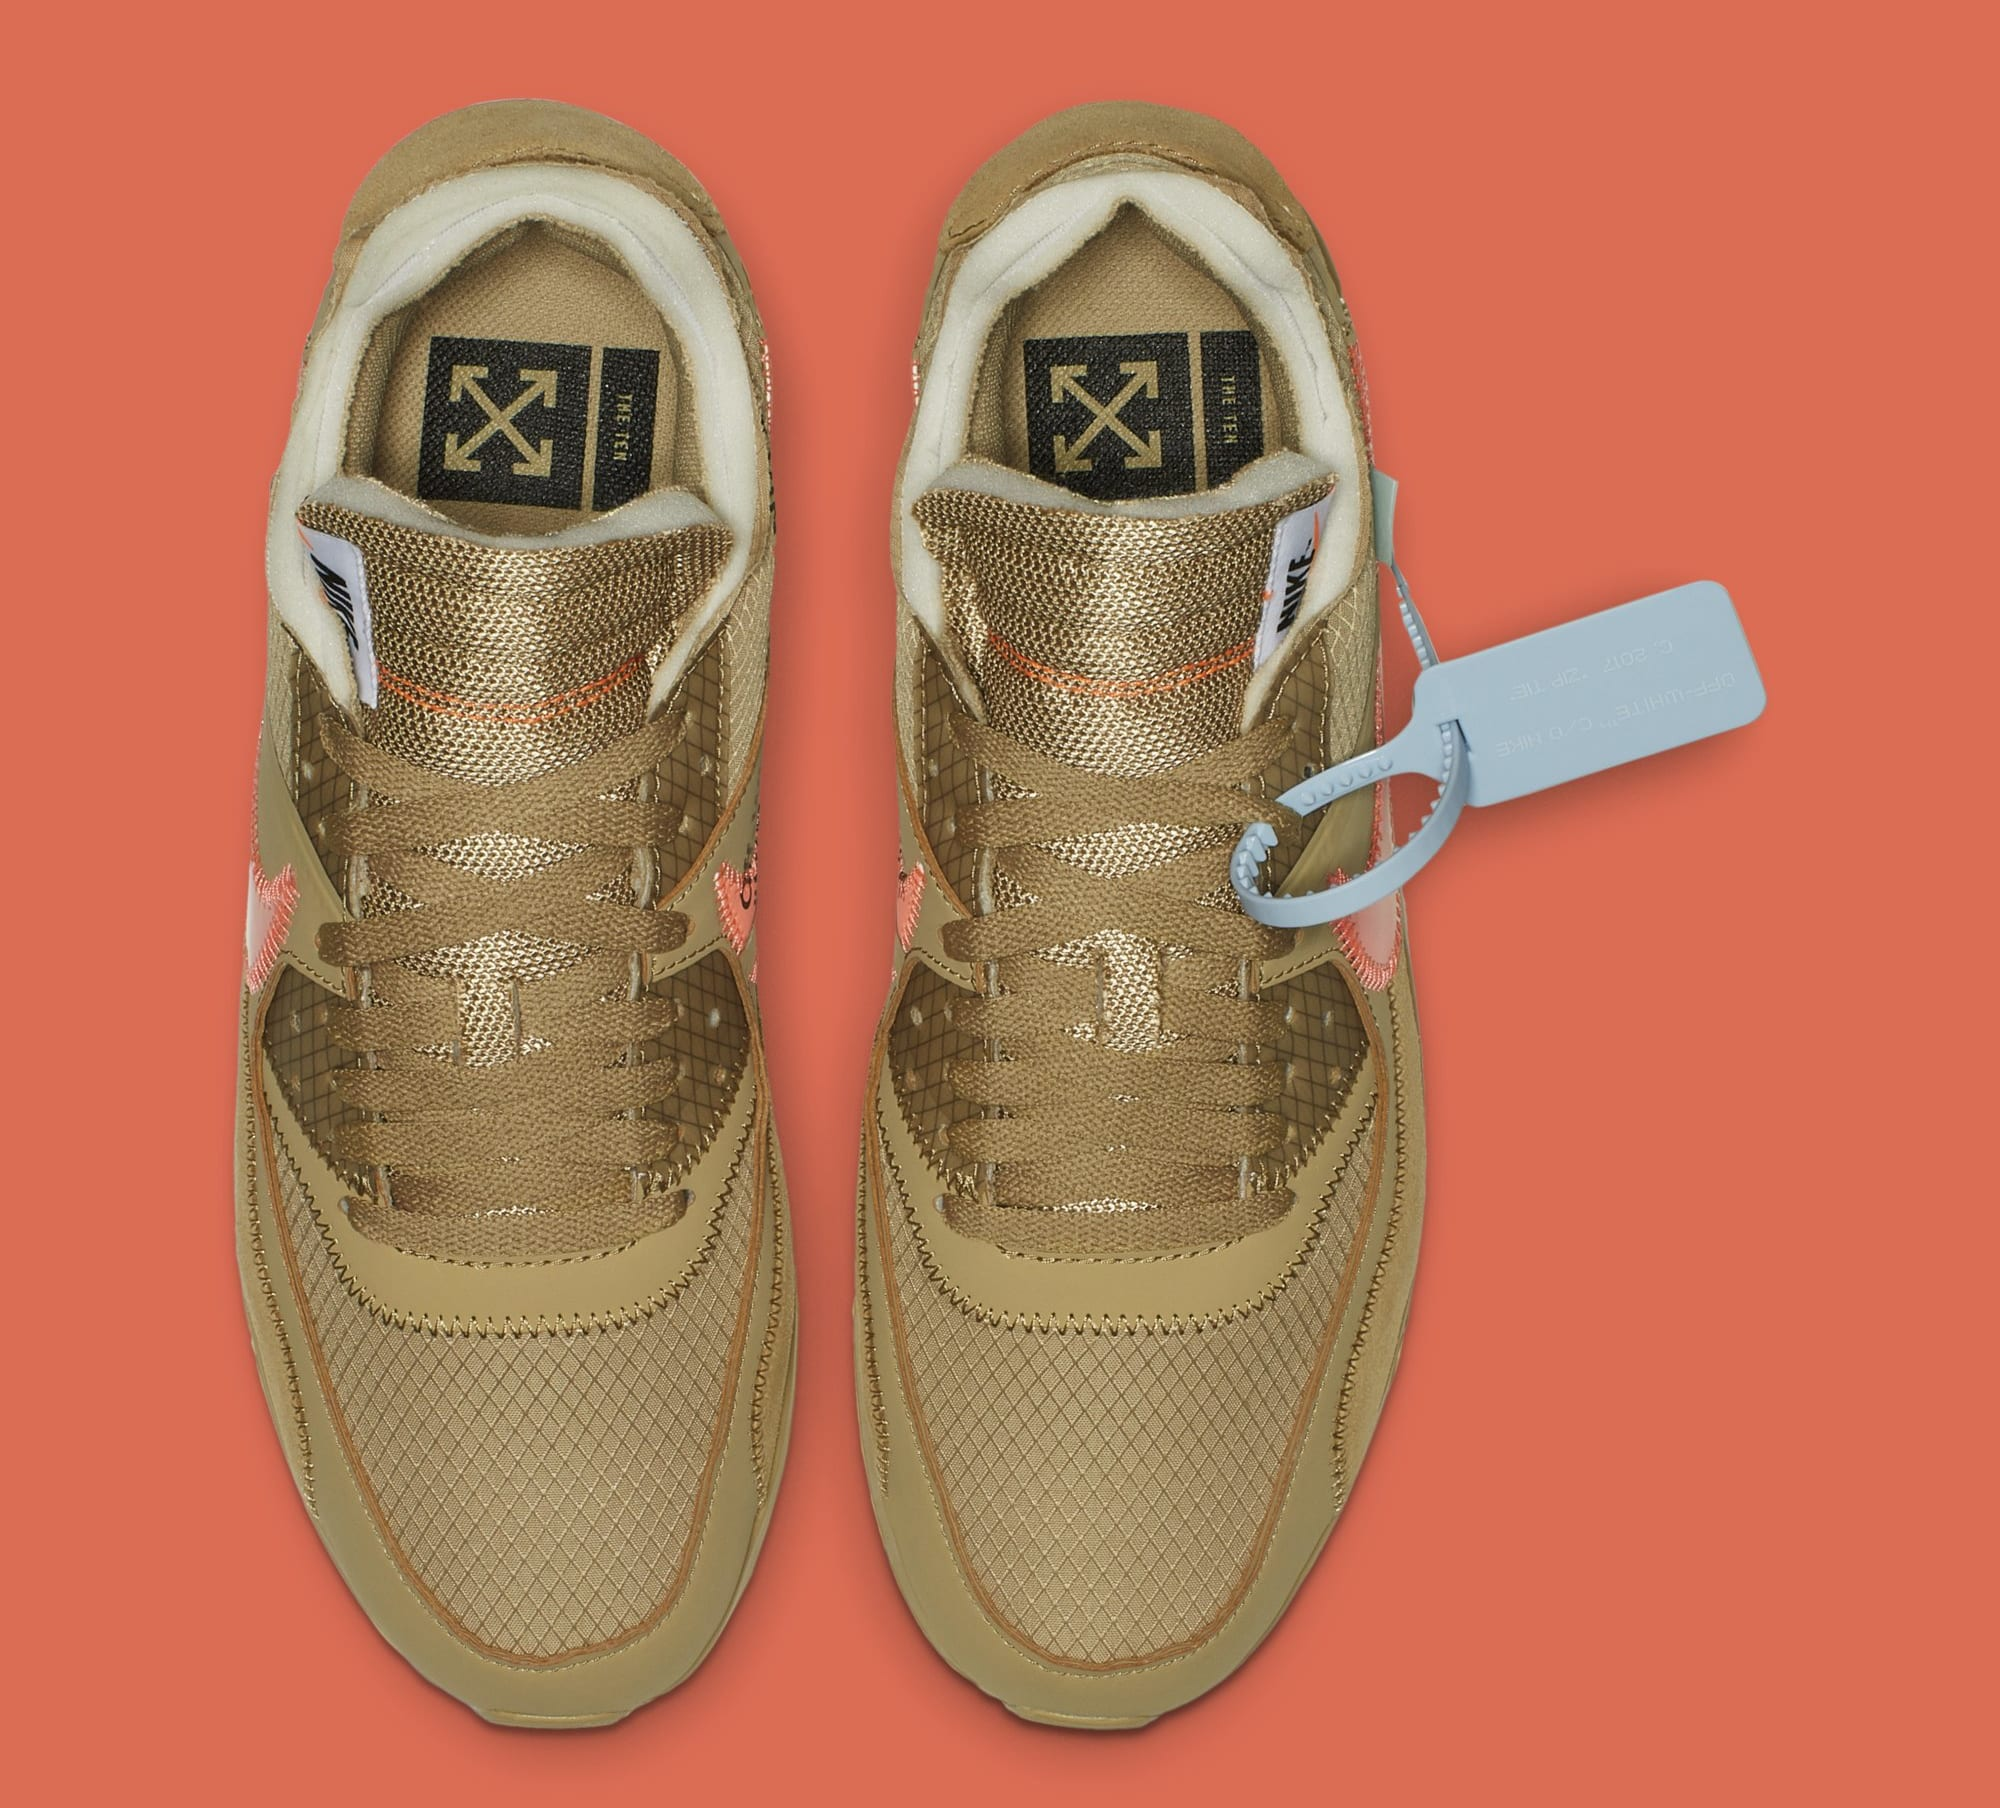 Off White x Nike Air Max 90 'Desert Ore' AA7293 200 Release